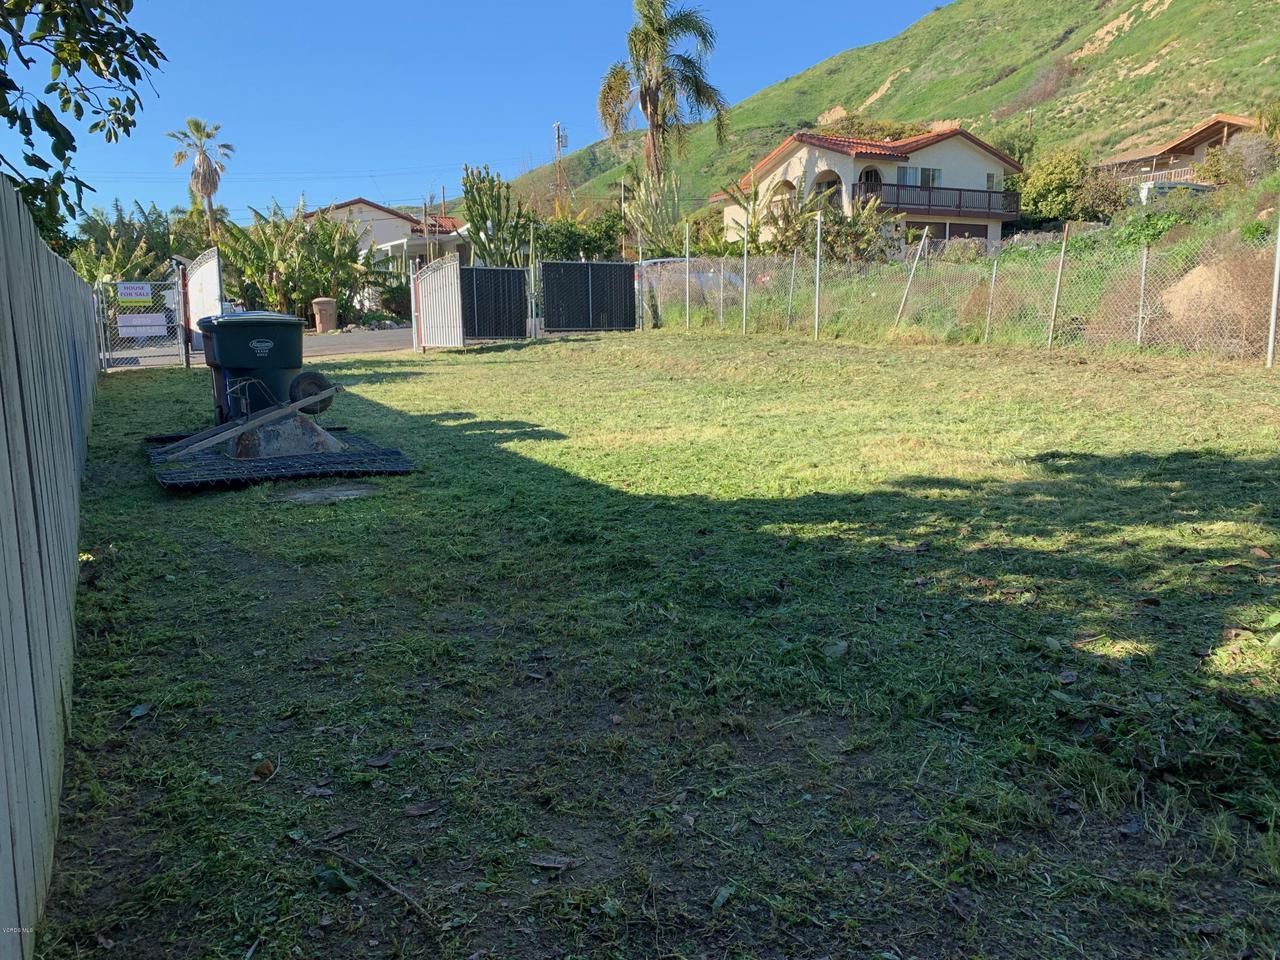 6850 ZELZAH, Ventura, CA 93001 - IMG_2482 (1)